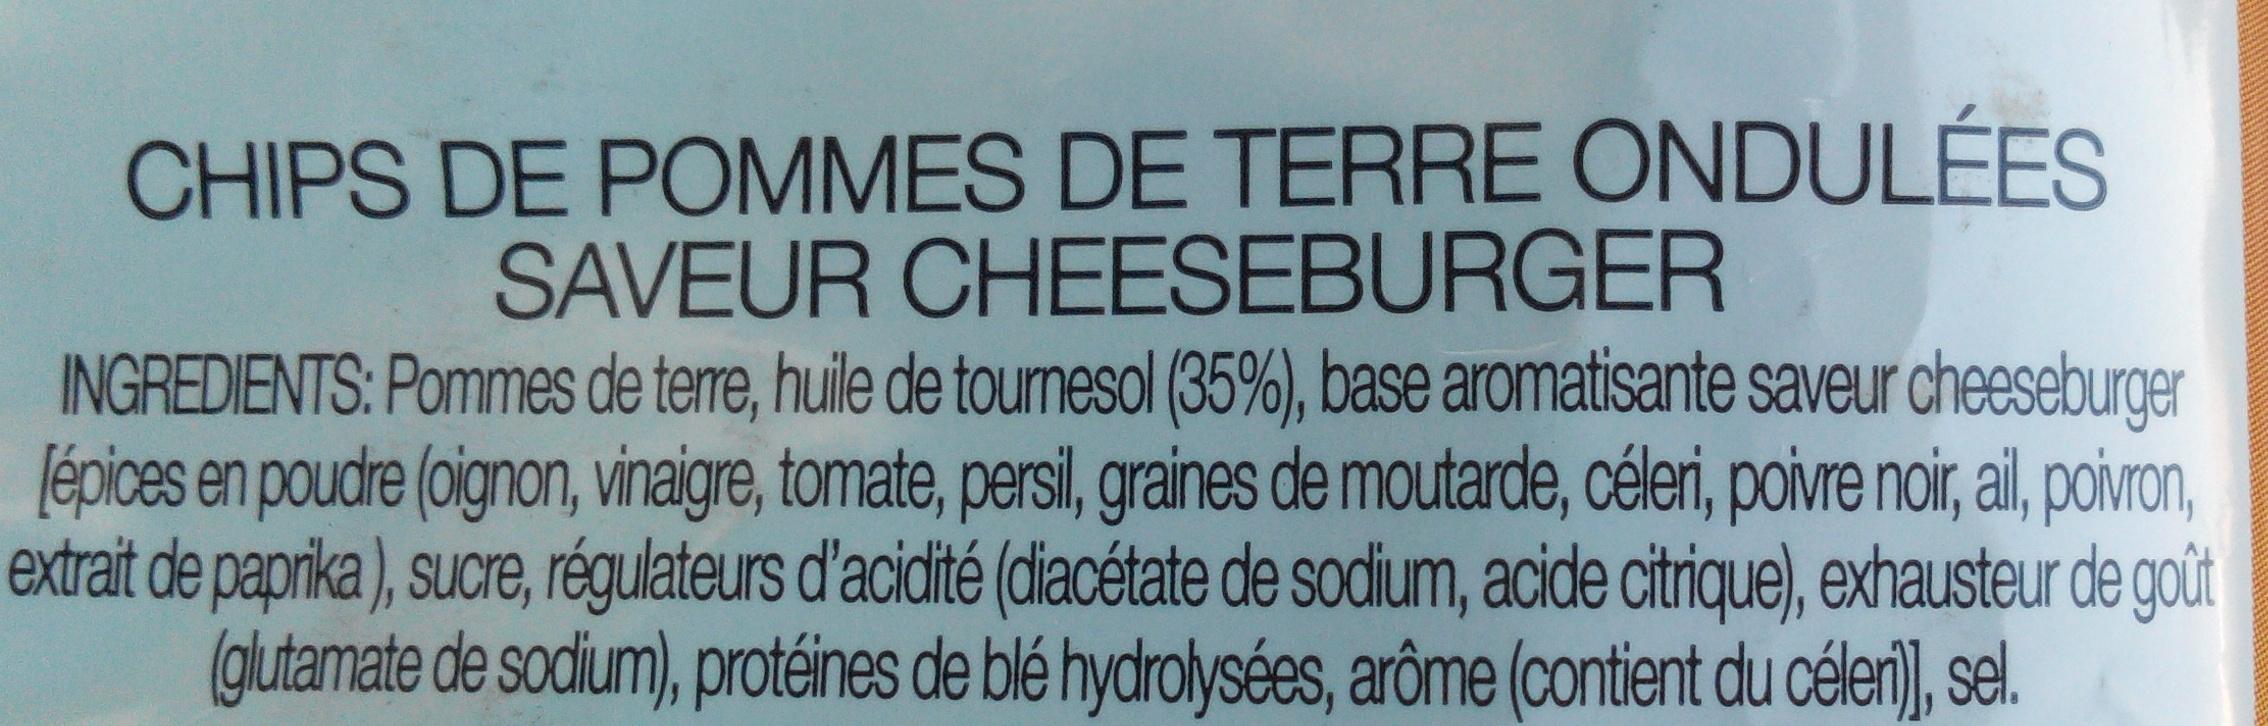 Maxi Craquantes Saveur Cheeseburger - Ingrédients